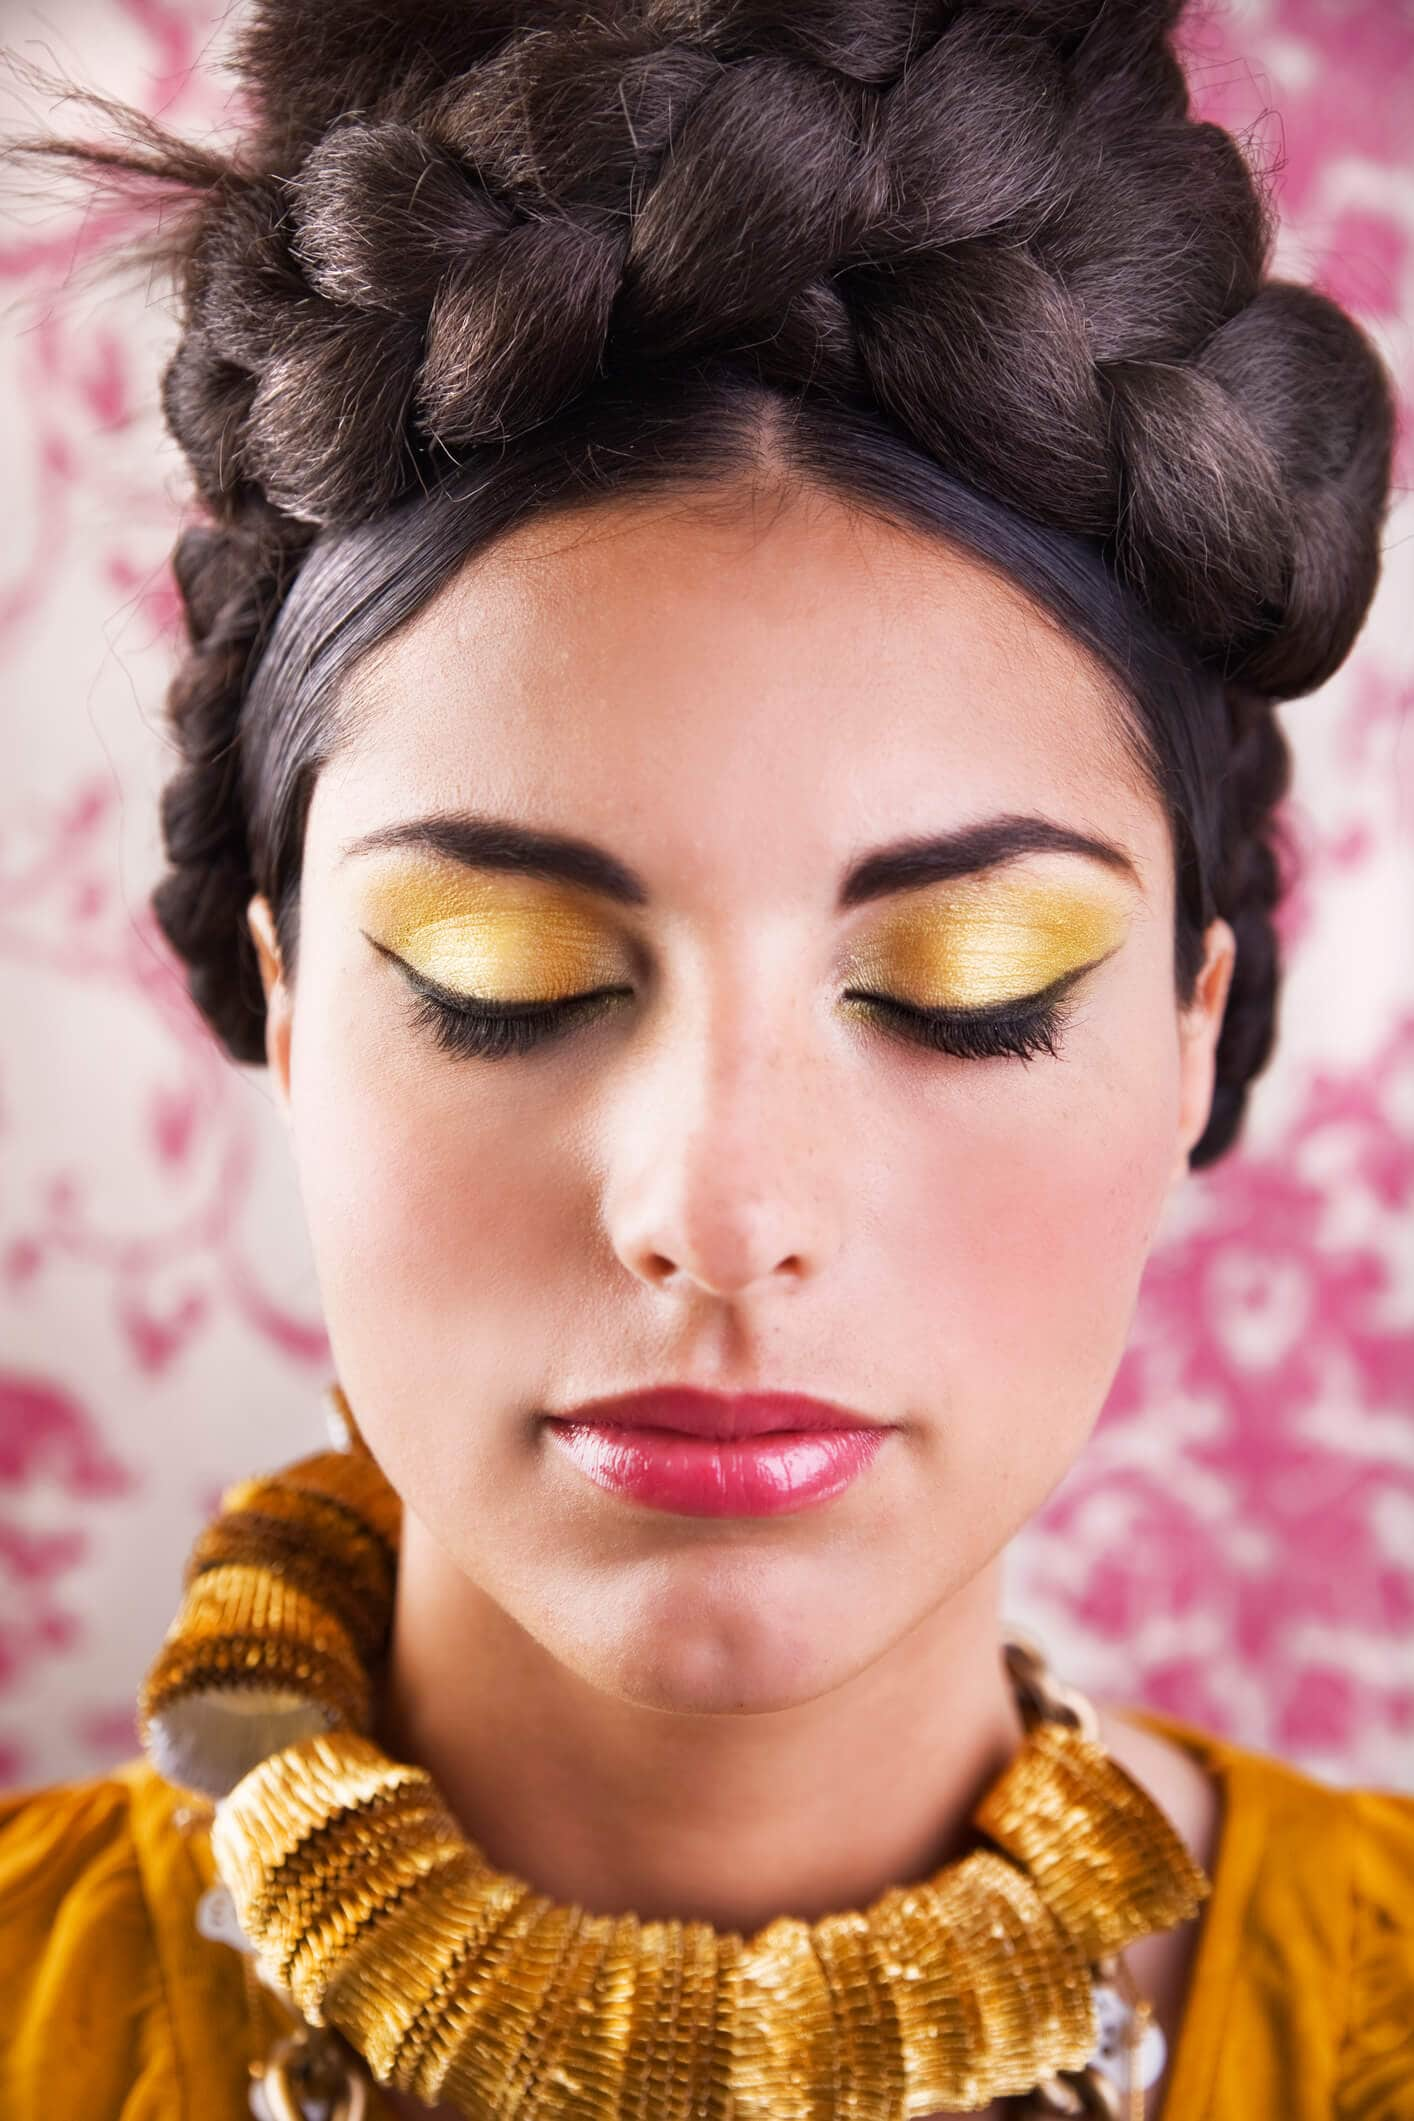 Fácil peinados mexicanos Colección de estilo de color de pelo - 7 Peinados mexicanos para lucirte en las fiestas